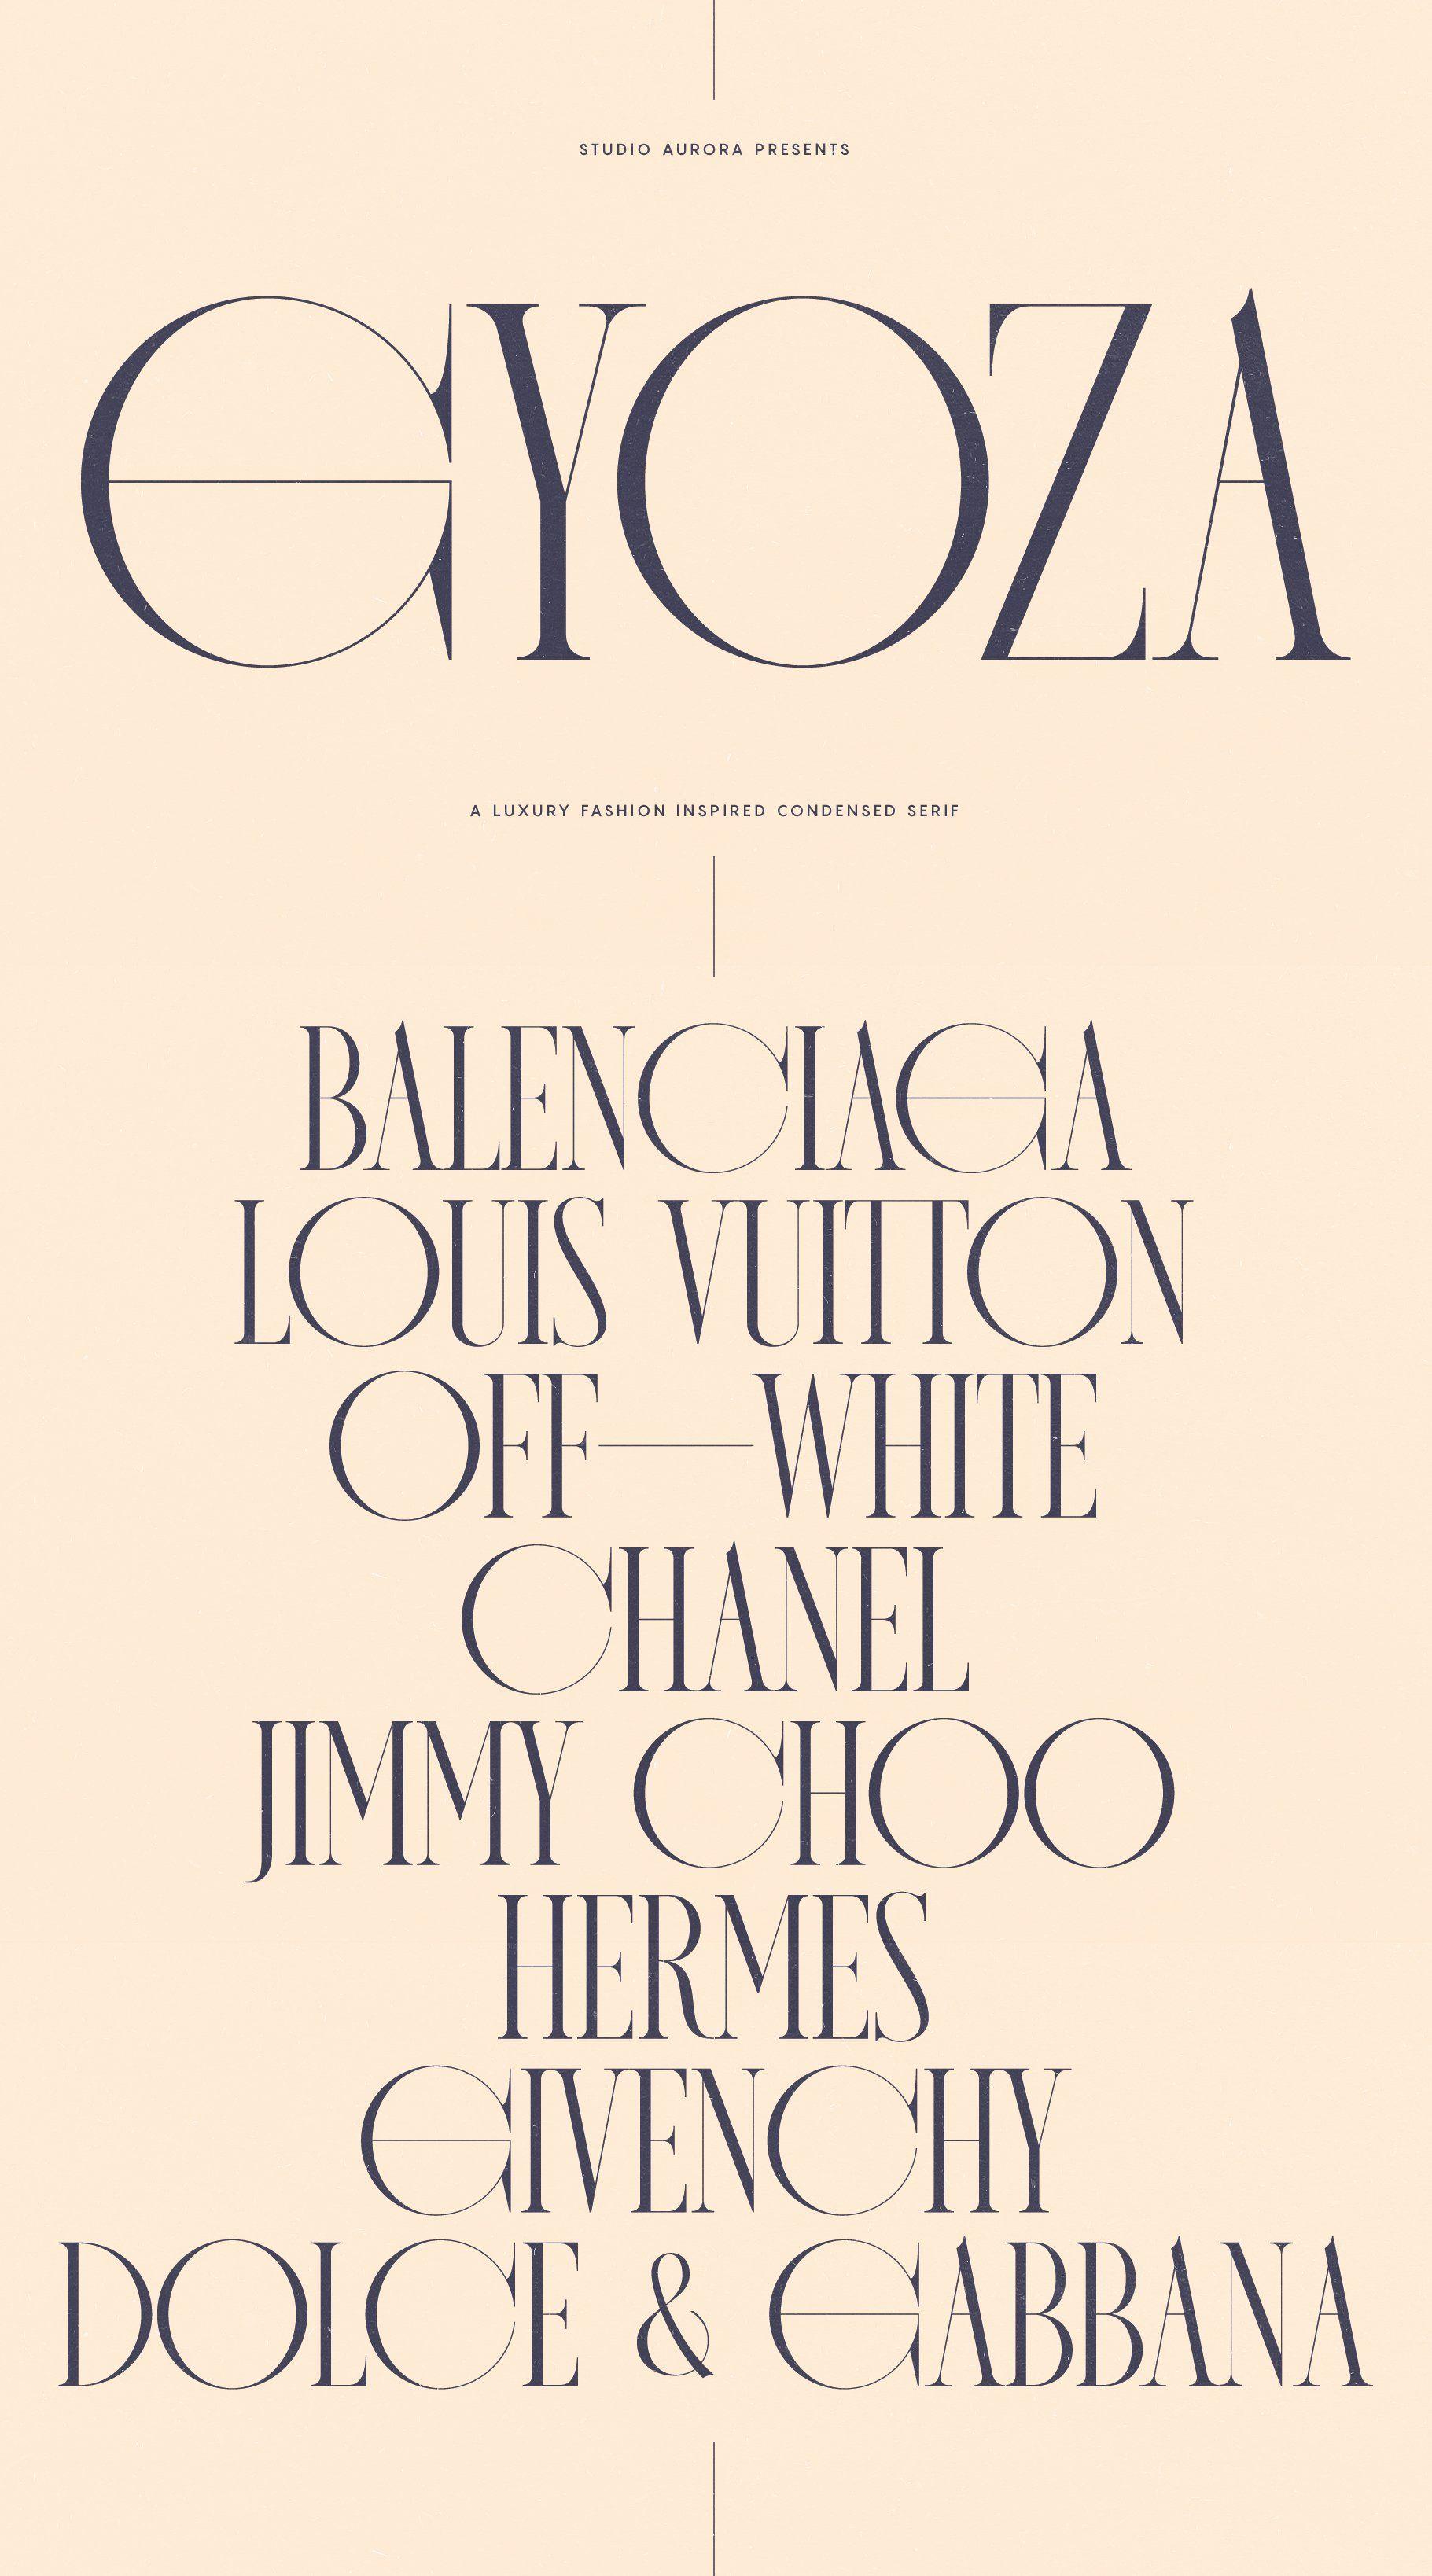 Gyoza Luxury Fashion Condensed Serif by Studio Aurora on @creativemarket